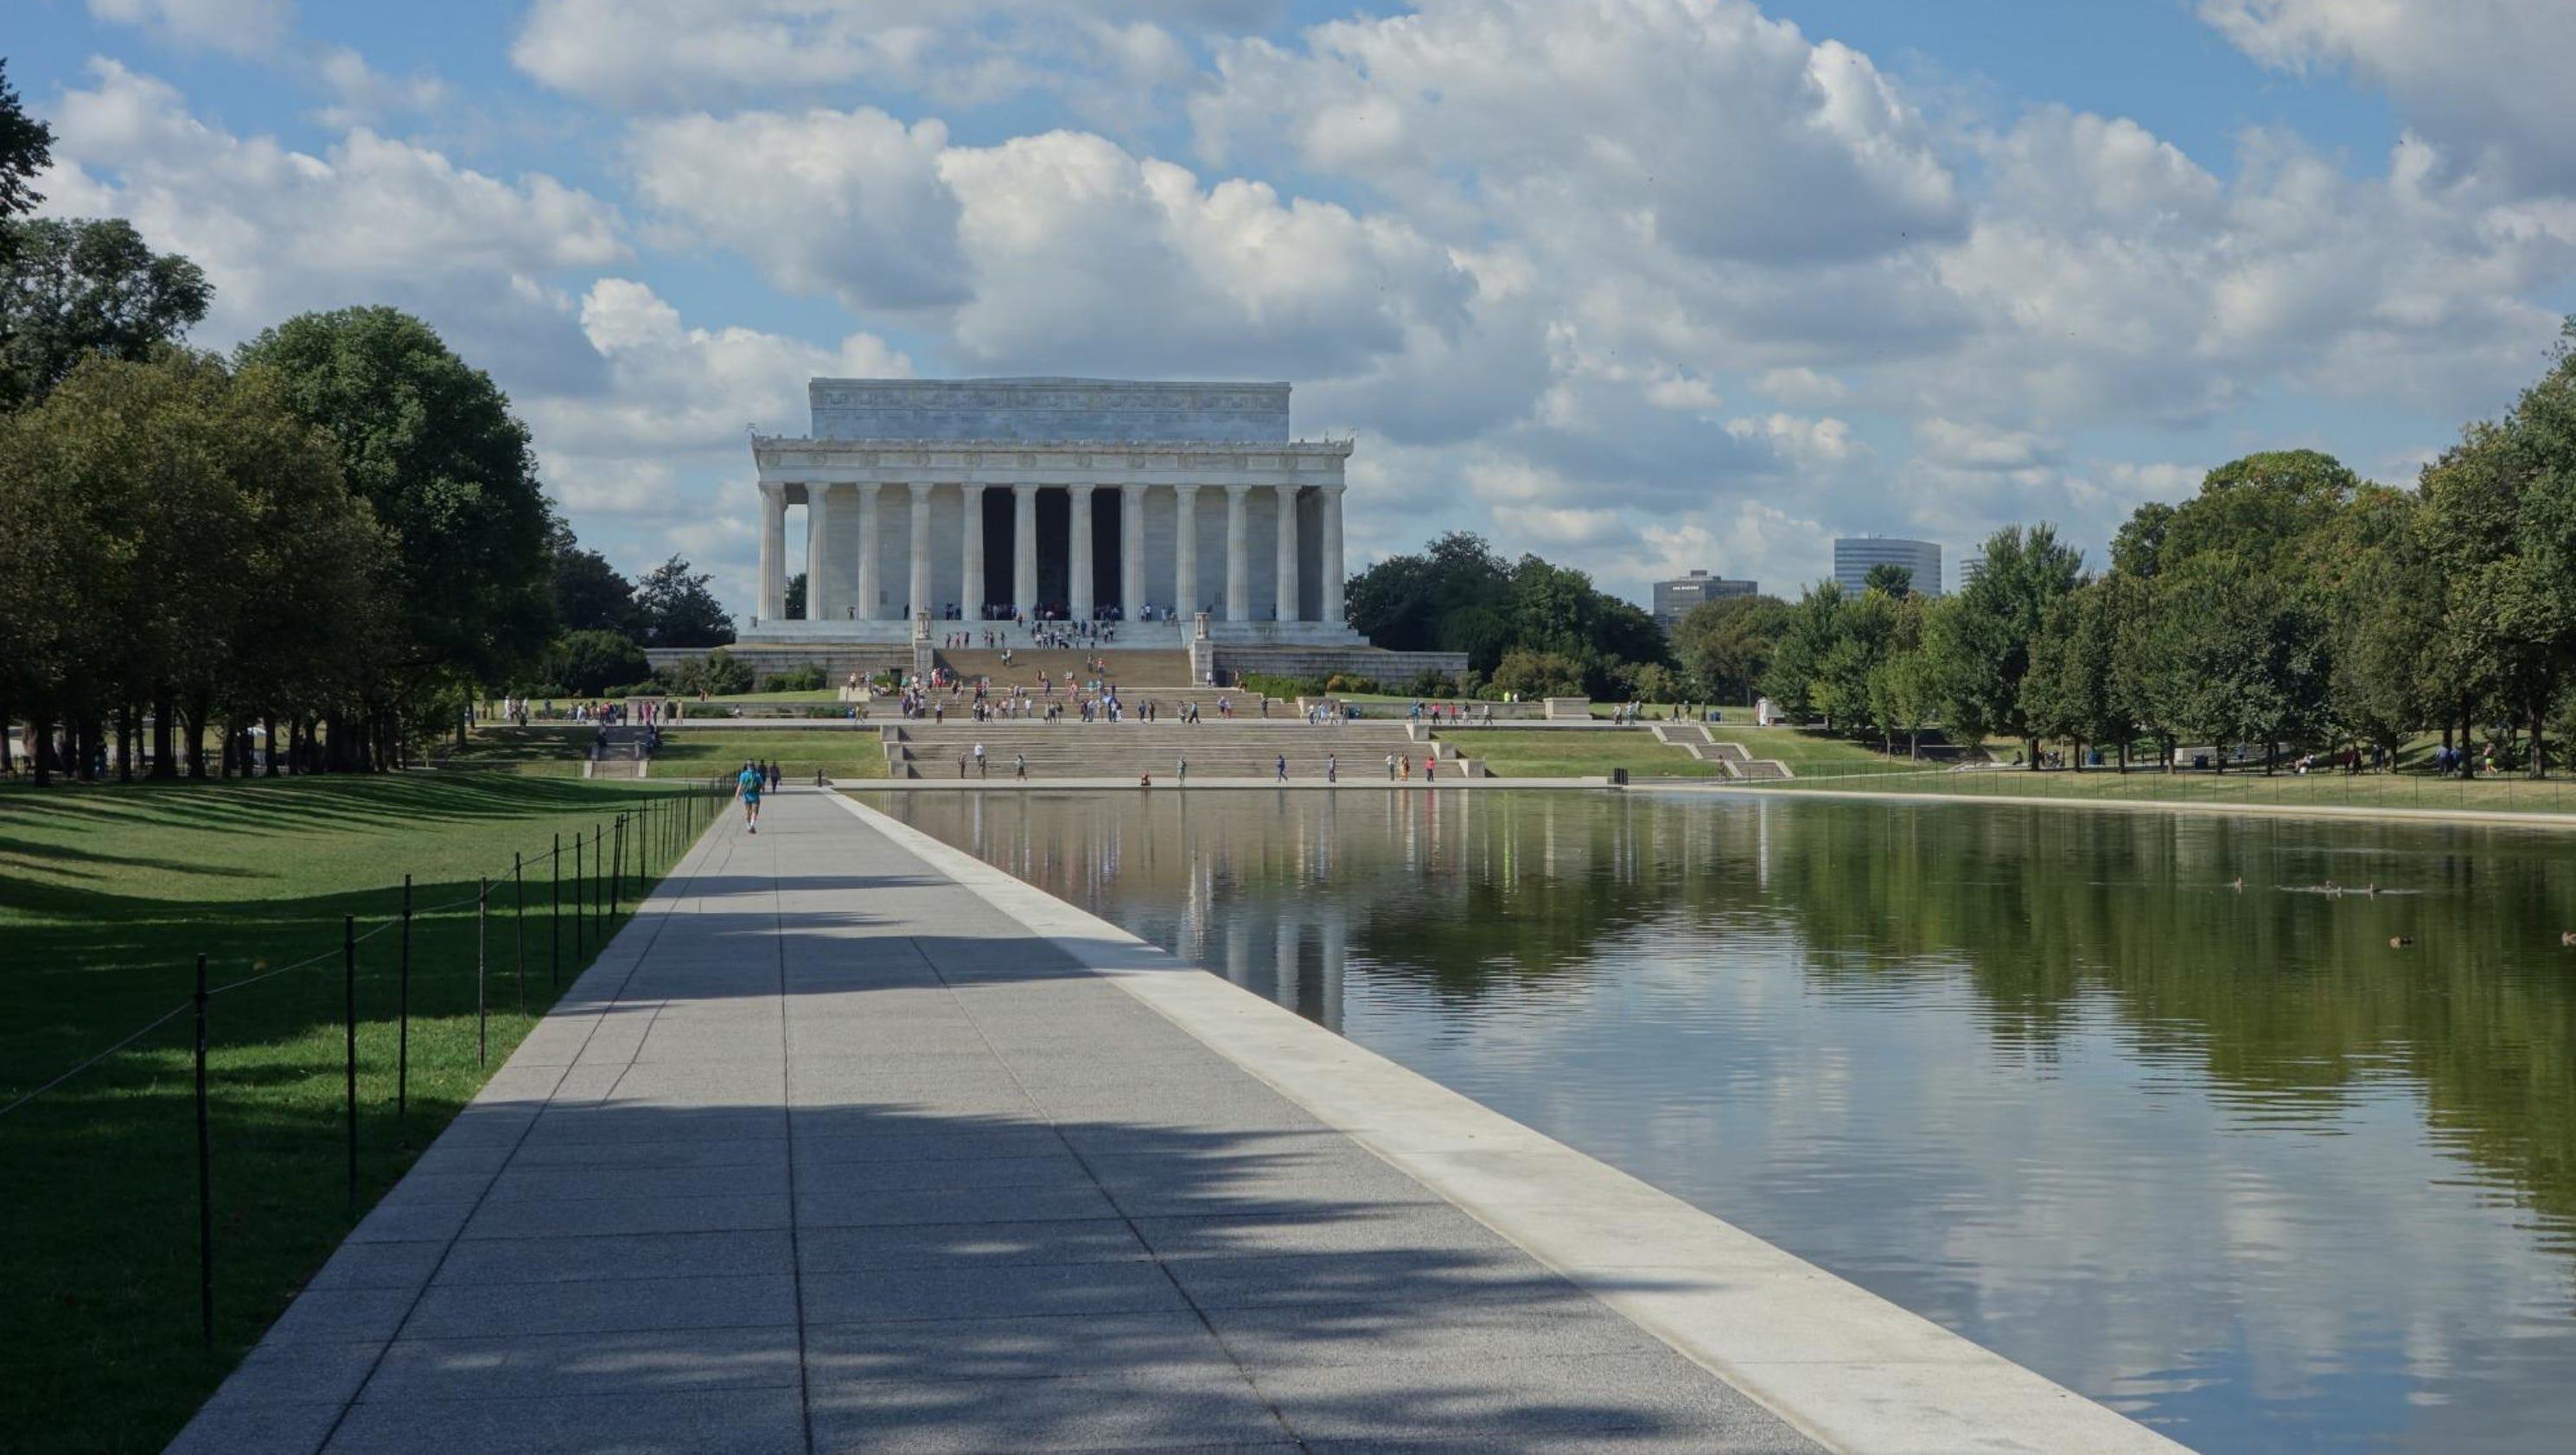 Tripadvisor names the world 39 s top landmarks for 2016 - Reflecting pool ...